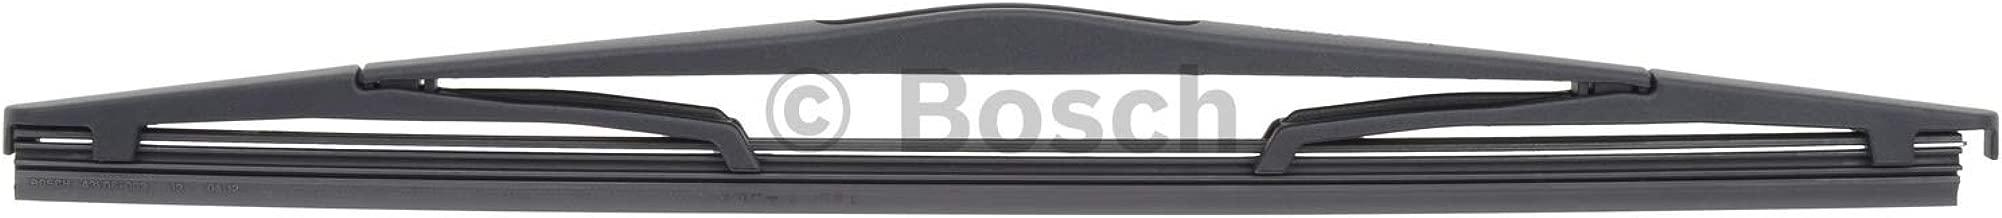 Bosch Rear Wiper Blade H300 /3397004628 Original Equipment Replacement- 12